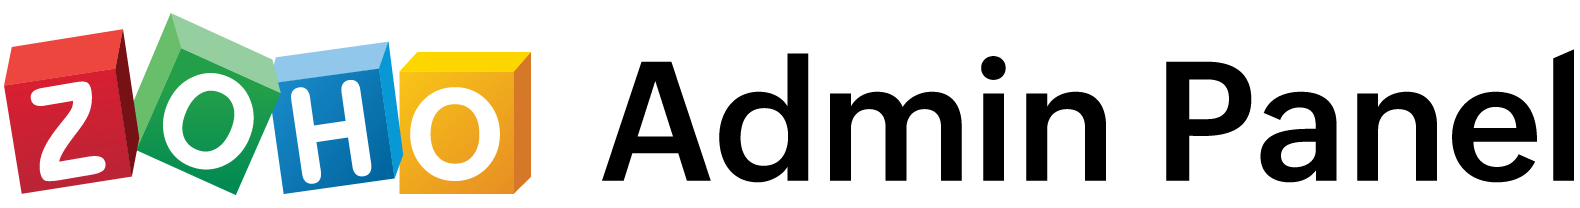 zoho adminpanel retina logo